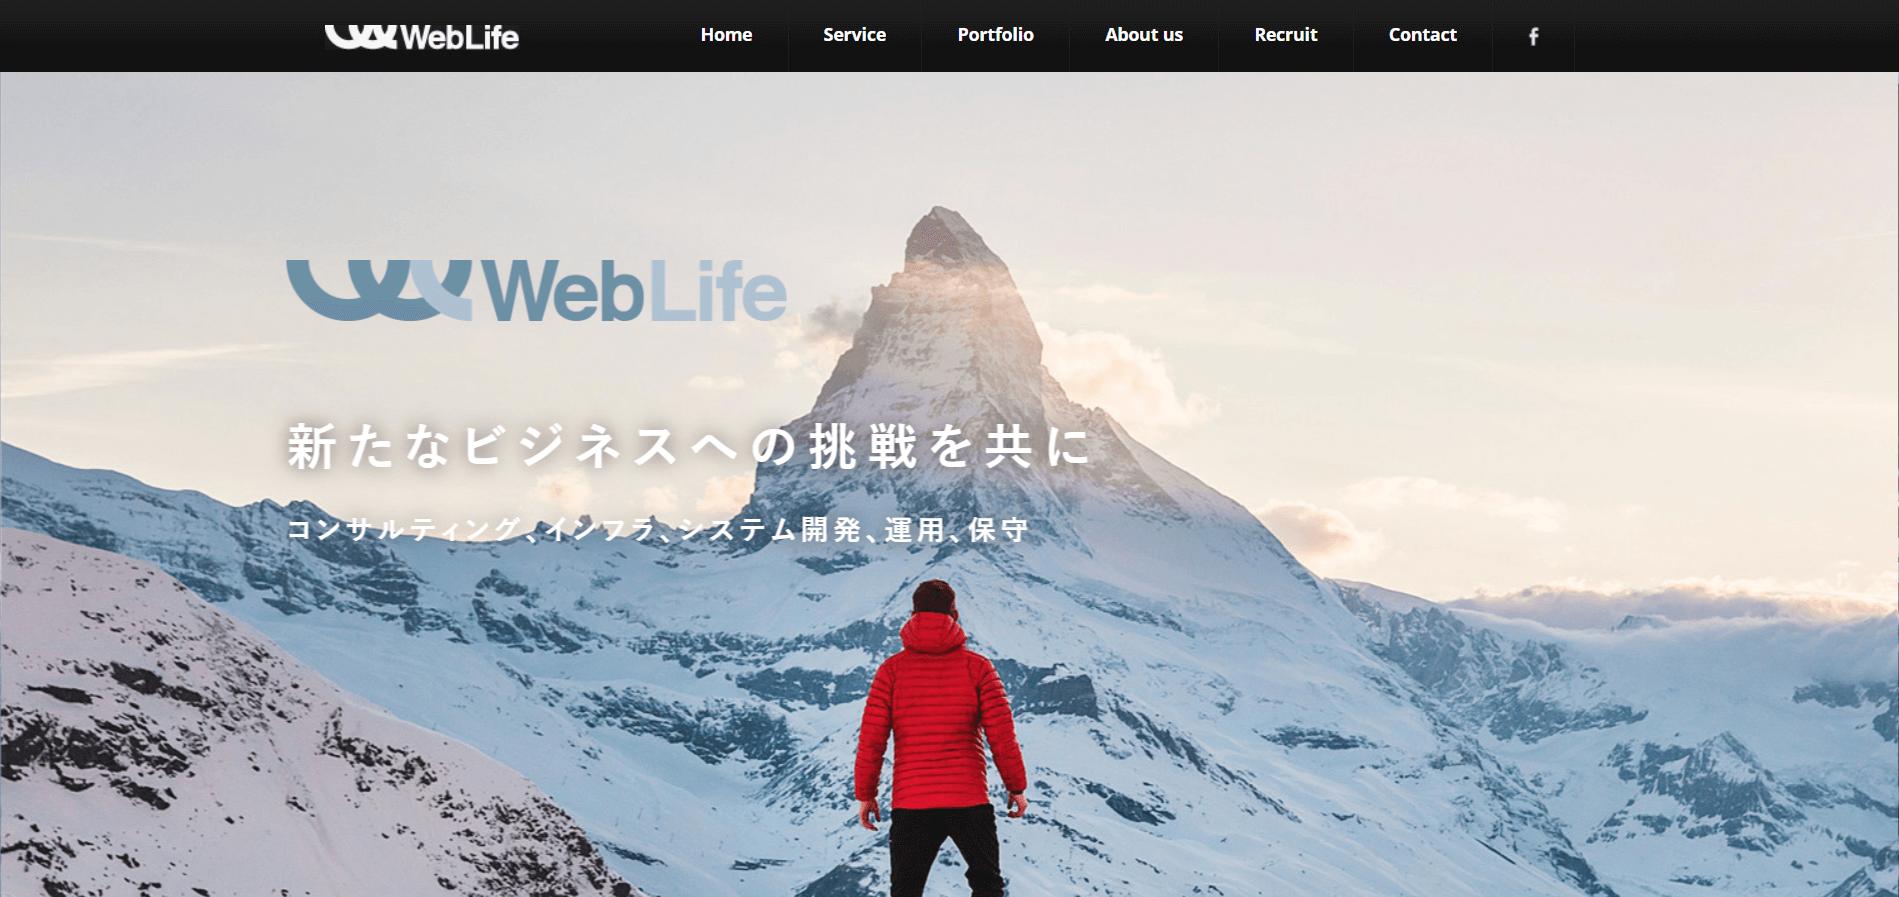 Shopify制作代行会社の株式会社WebLife